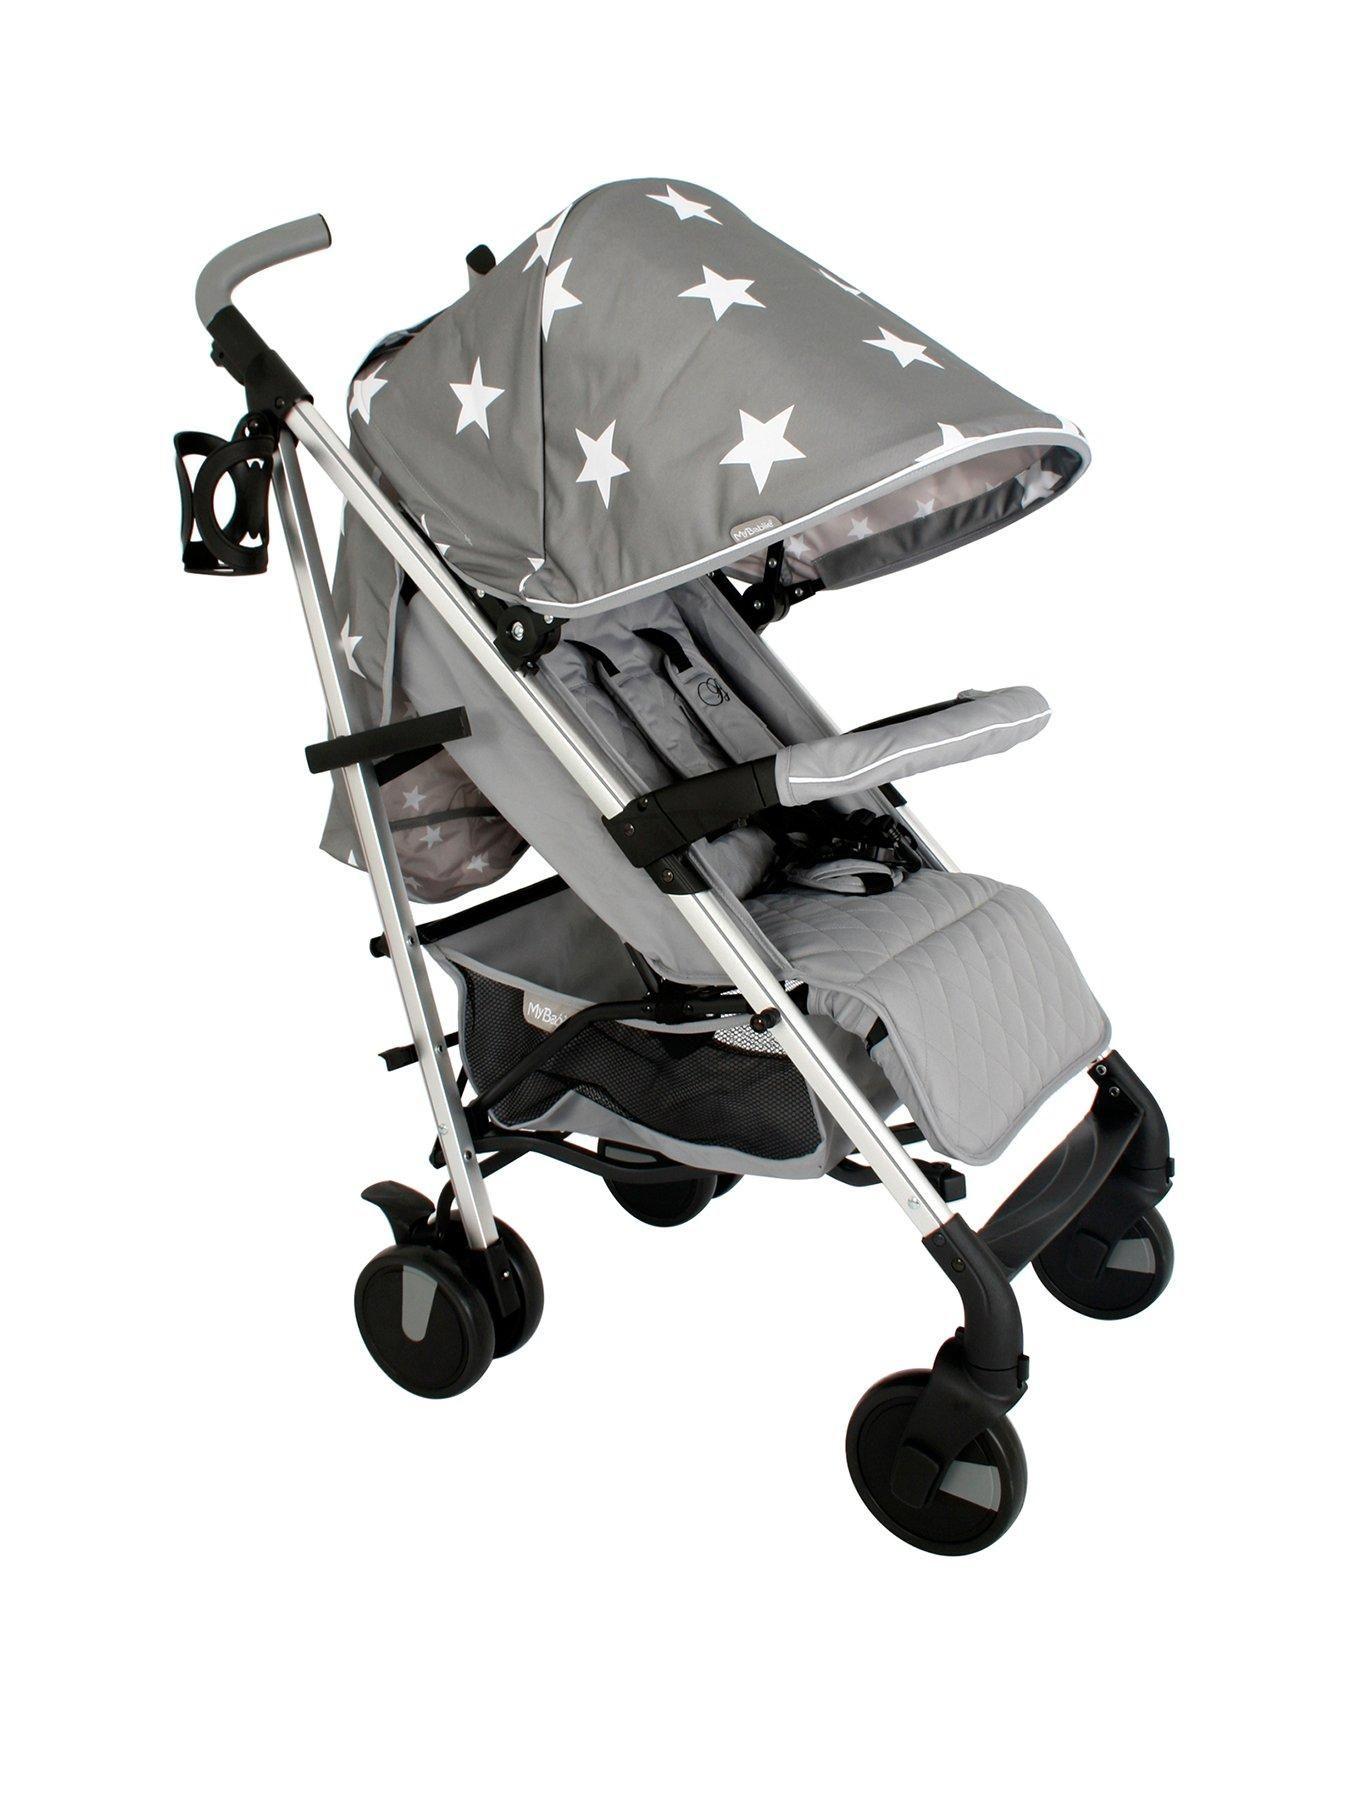 My Babiie My Babiie Billie Faiers Mb51 Grey Stars Stroller